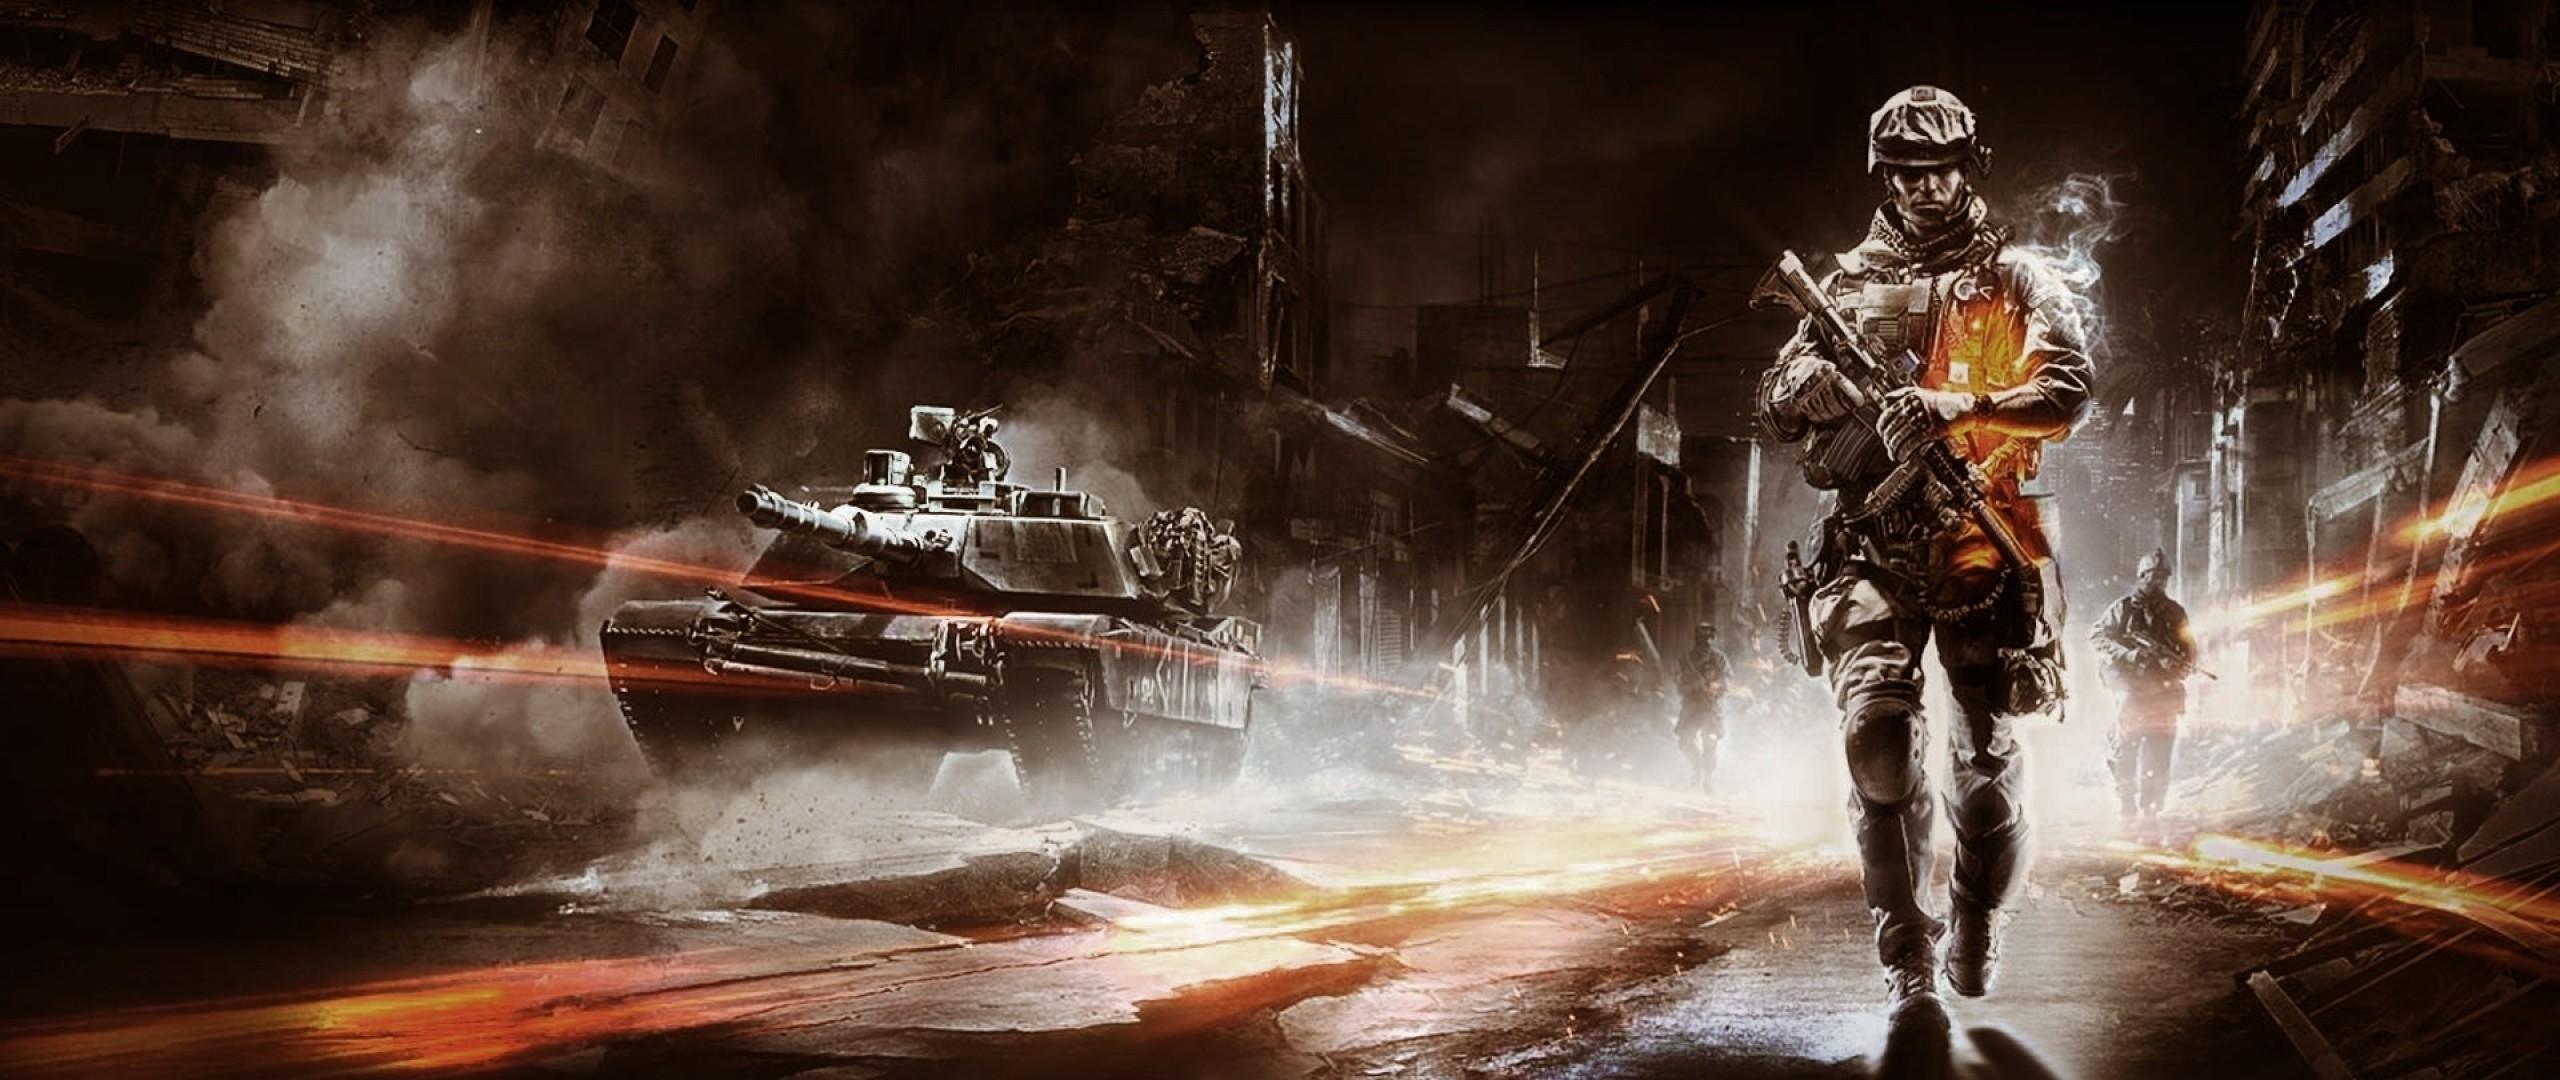 Wallpaper battlefield, soldier, city, tank, destruction